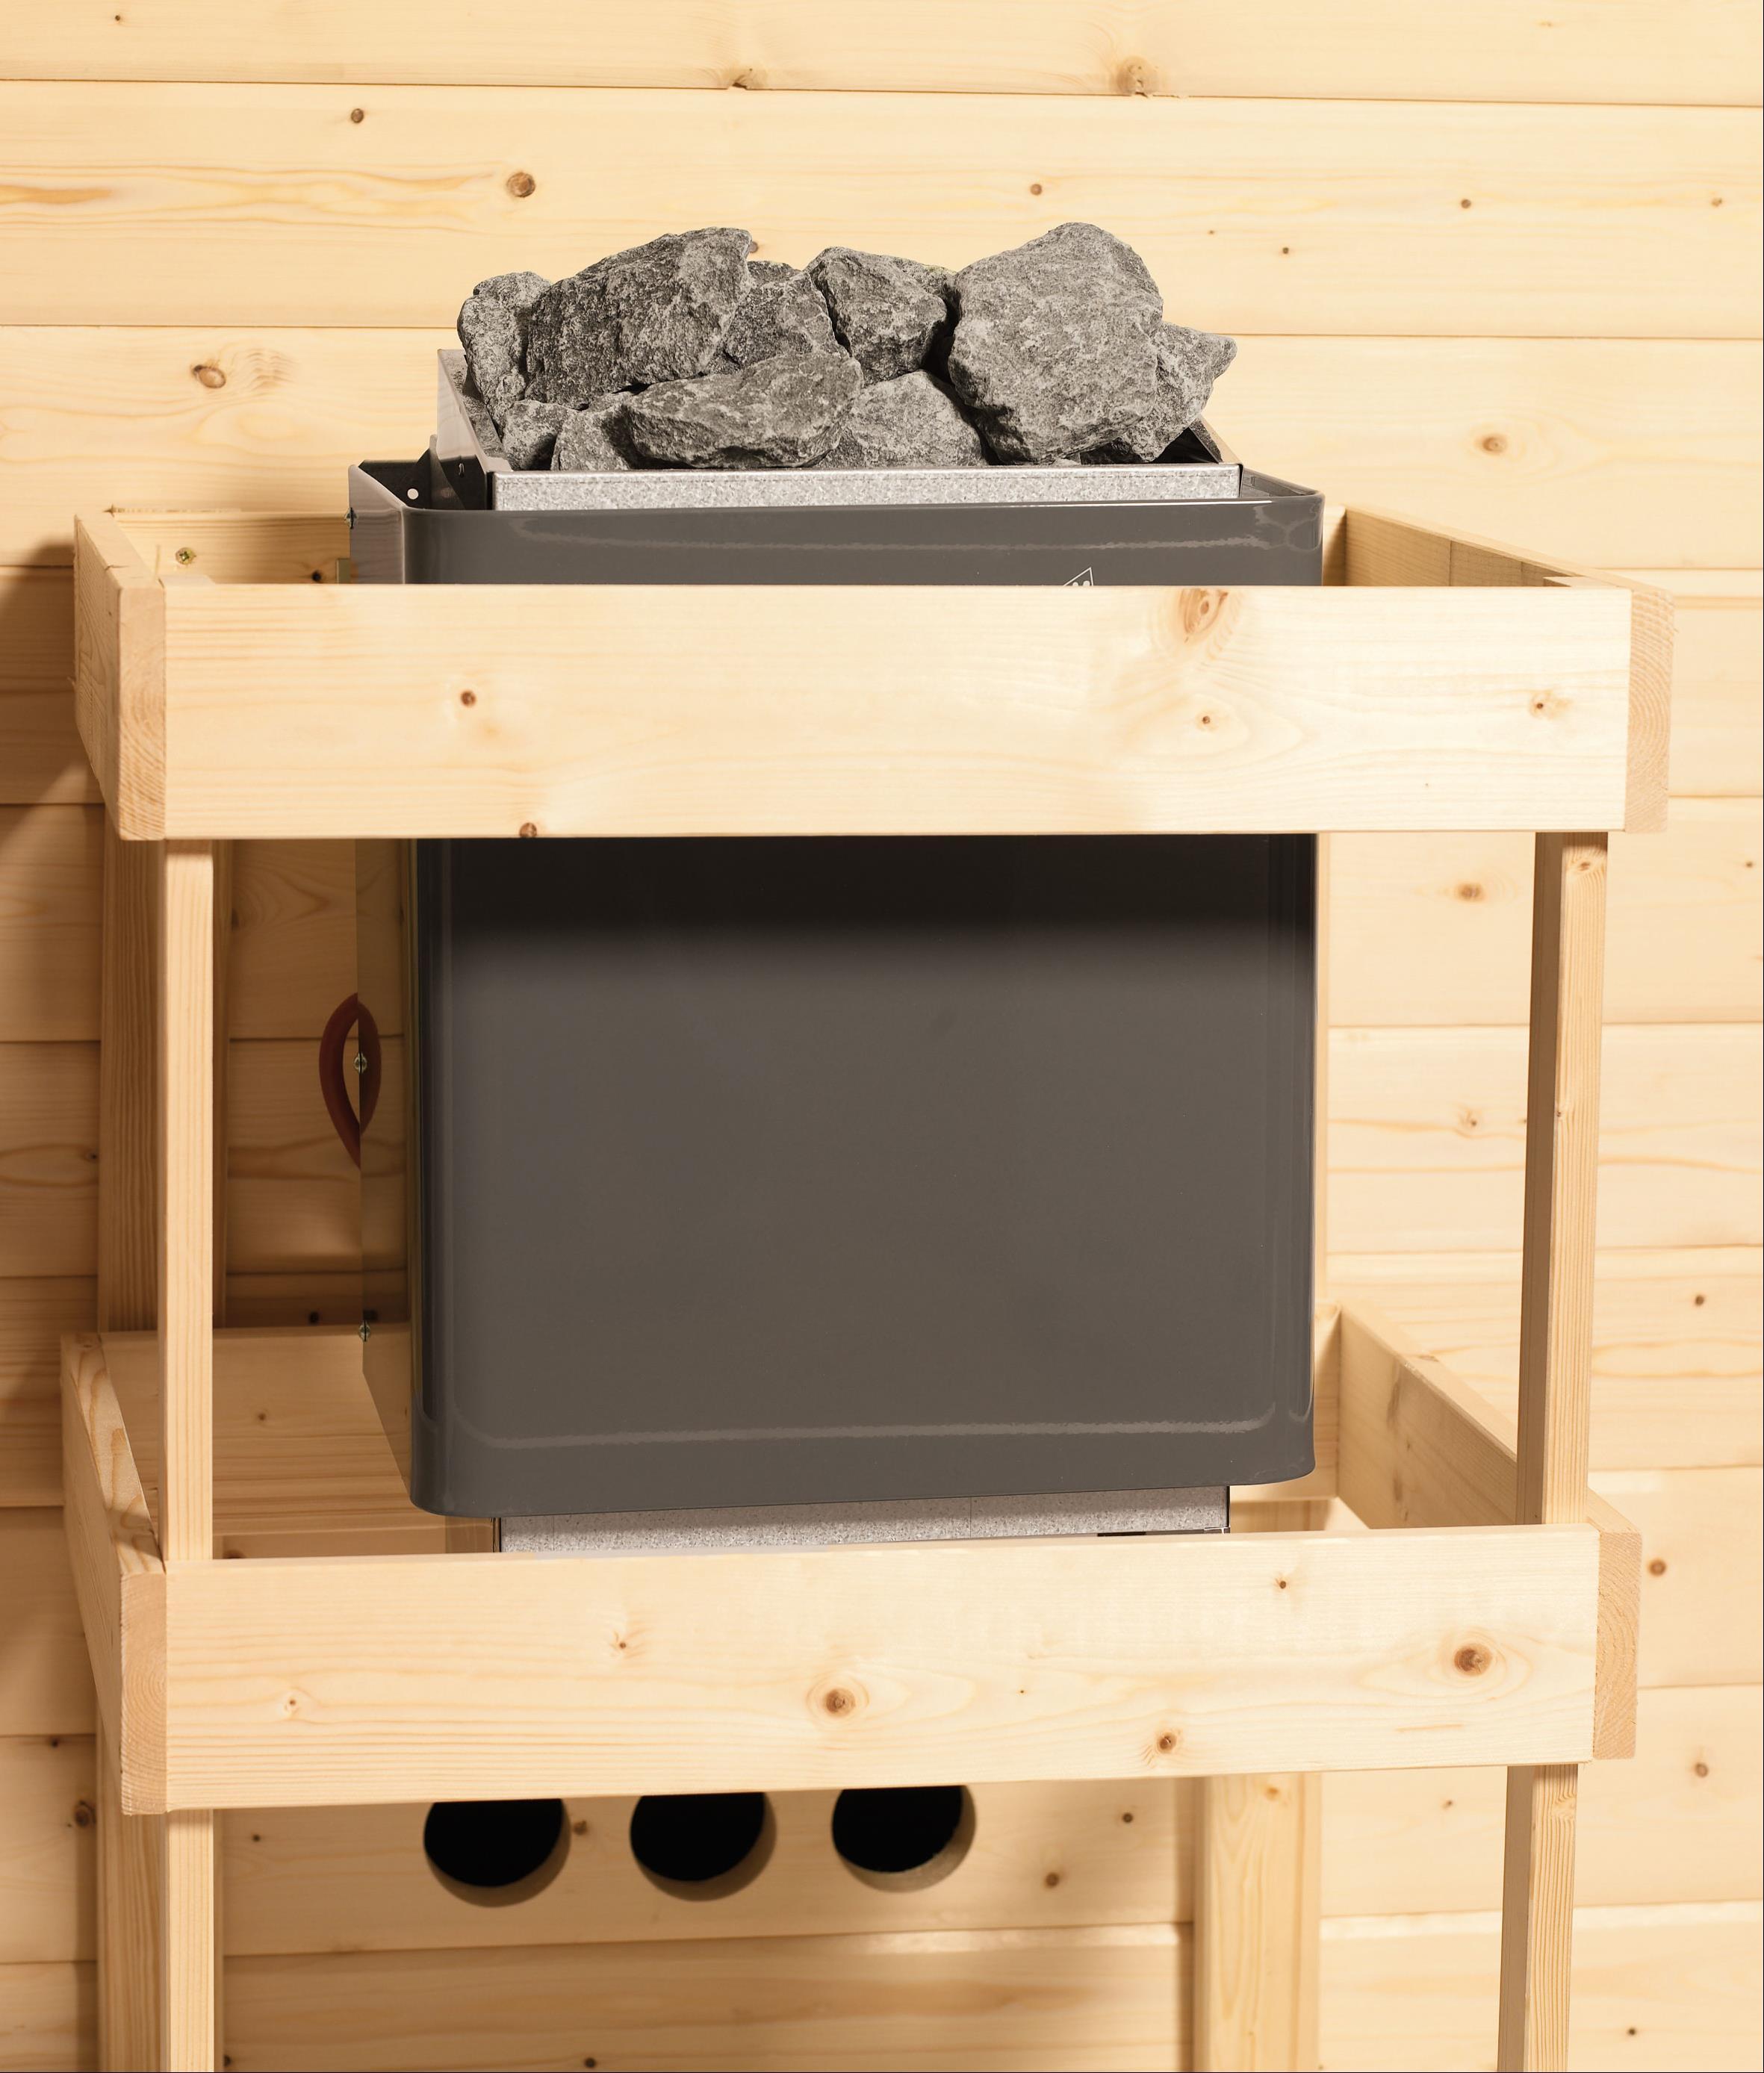 Woodfeeling Sauna Franka 38mm Bio Saunaofen 9kW ext. Kranz Holztür Bild 9